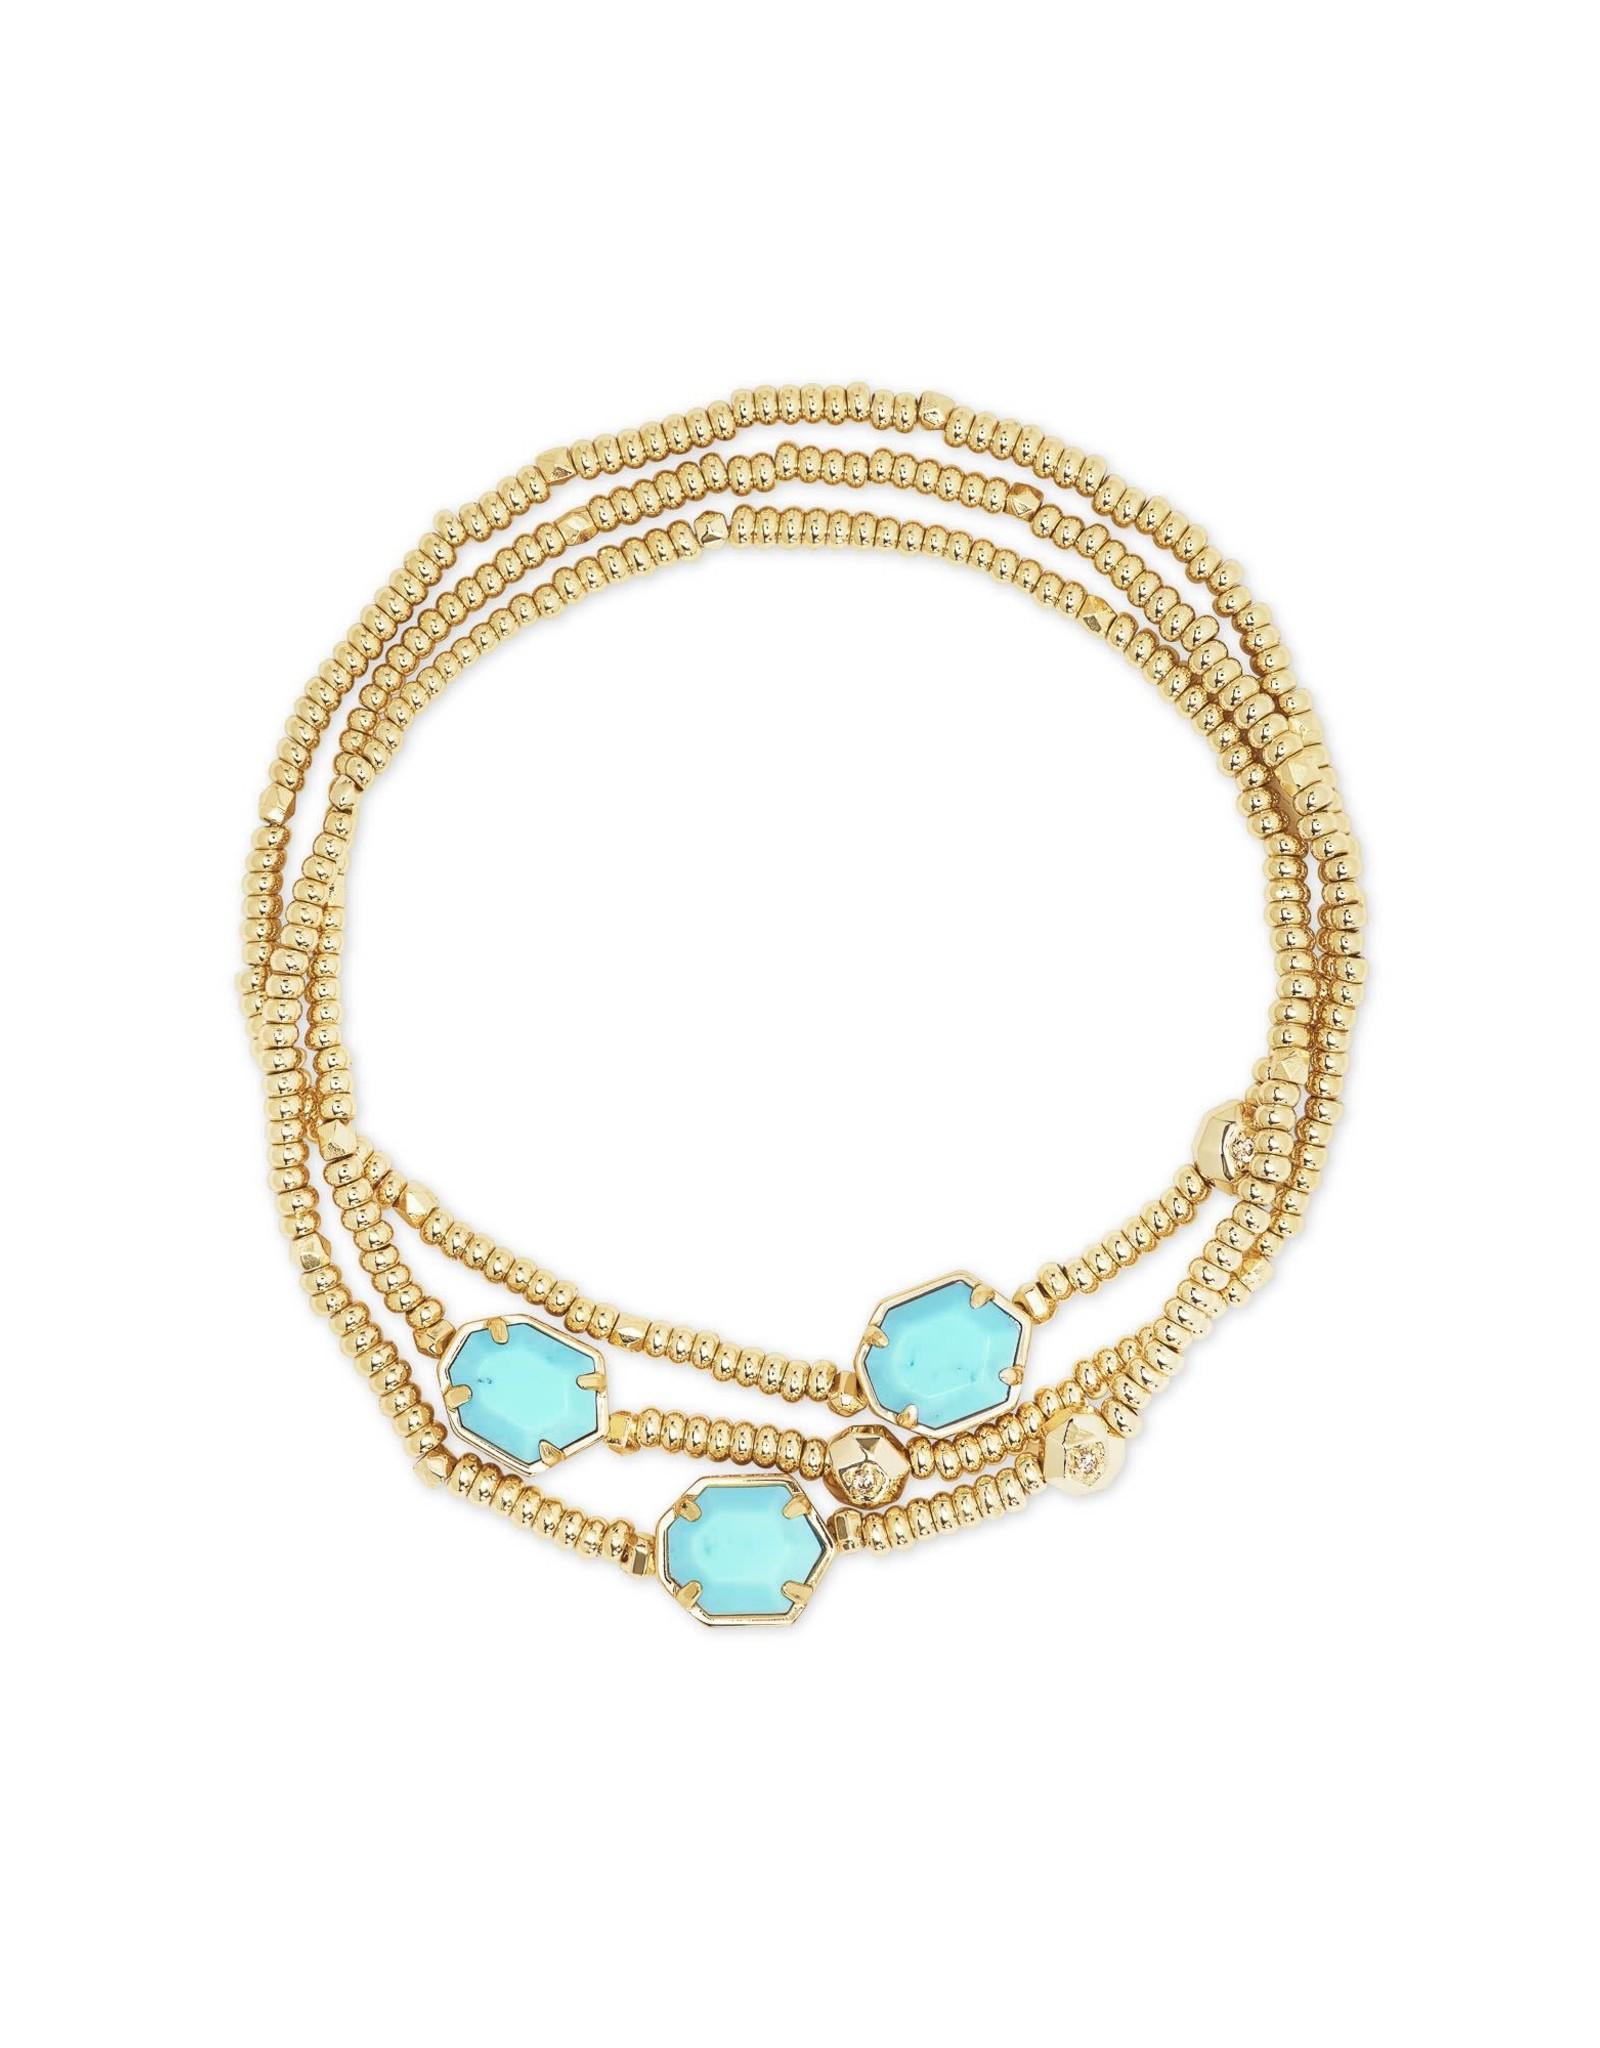 Kendra Scott Tomon Stretch Bracelet - Light Blue Magnesite/Gold